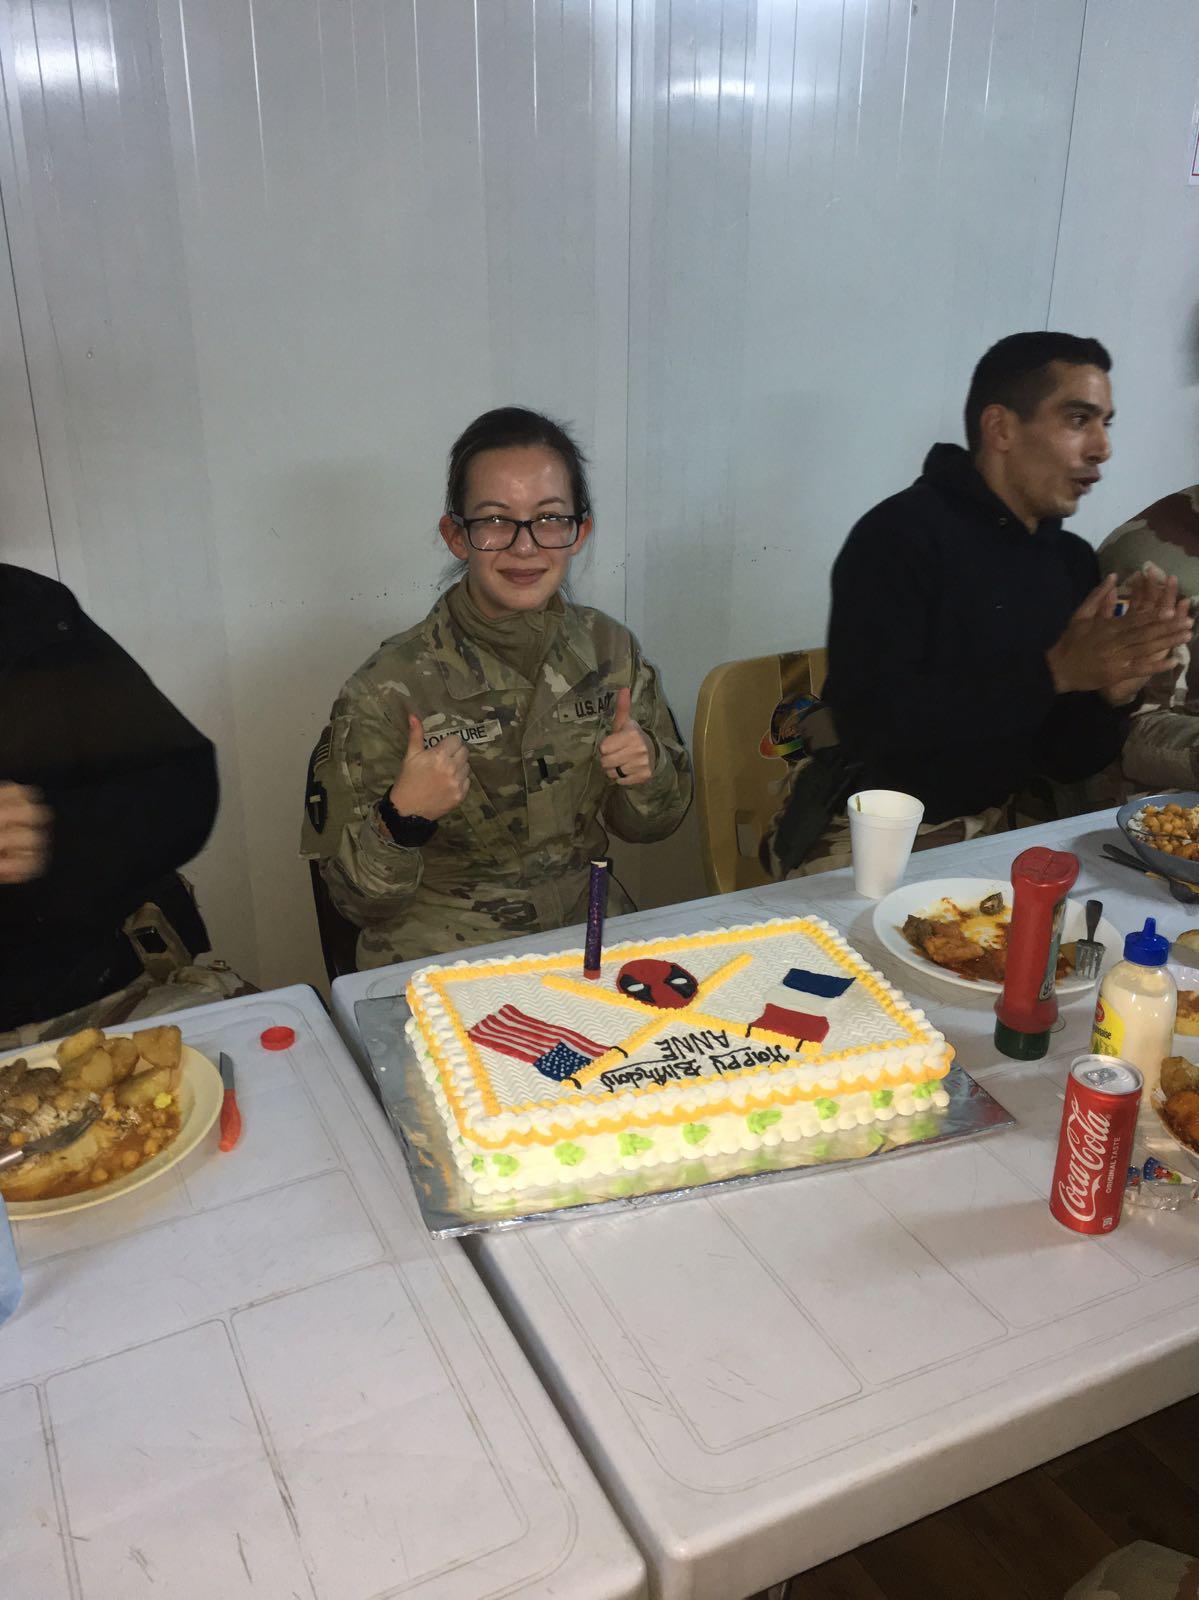 Celebrating my birthday in Iraq